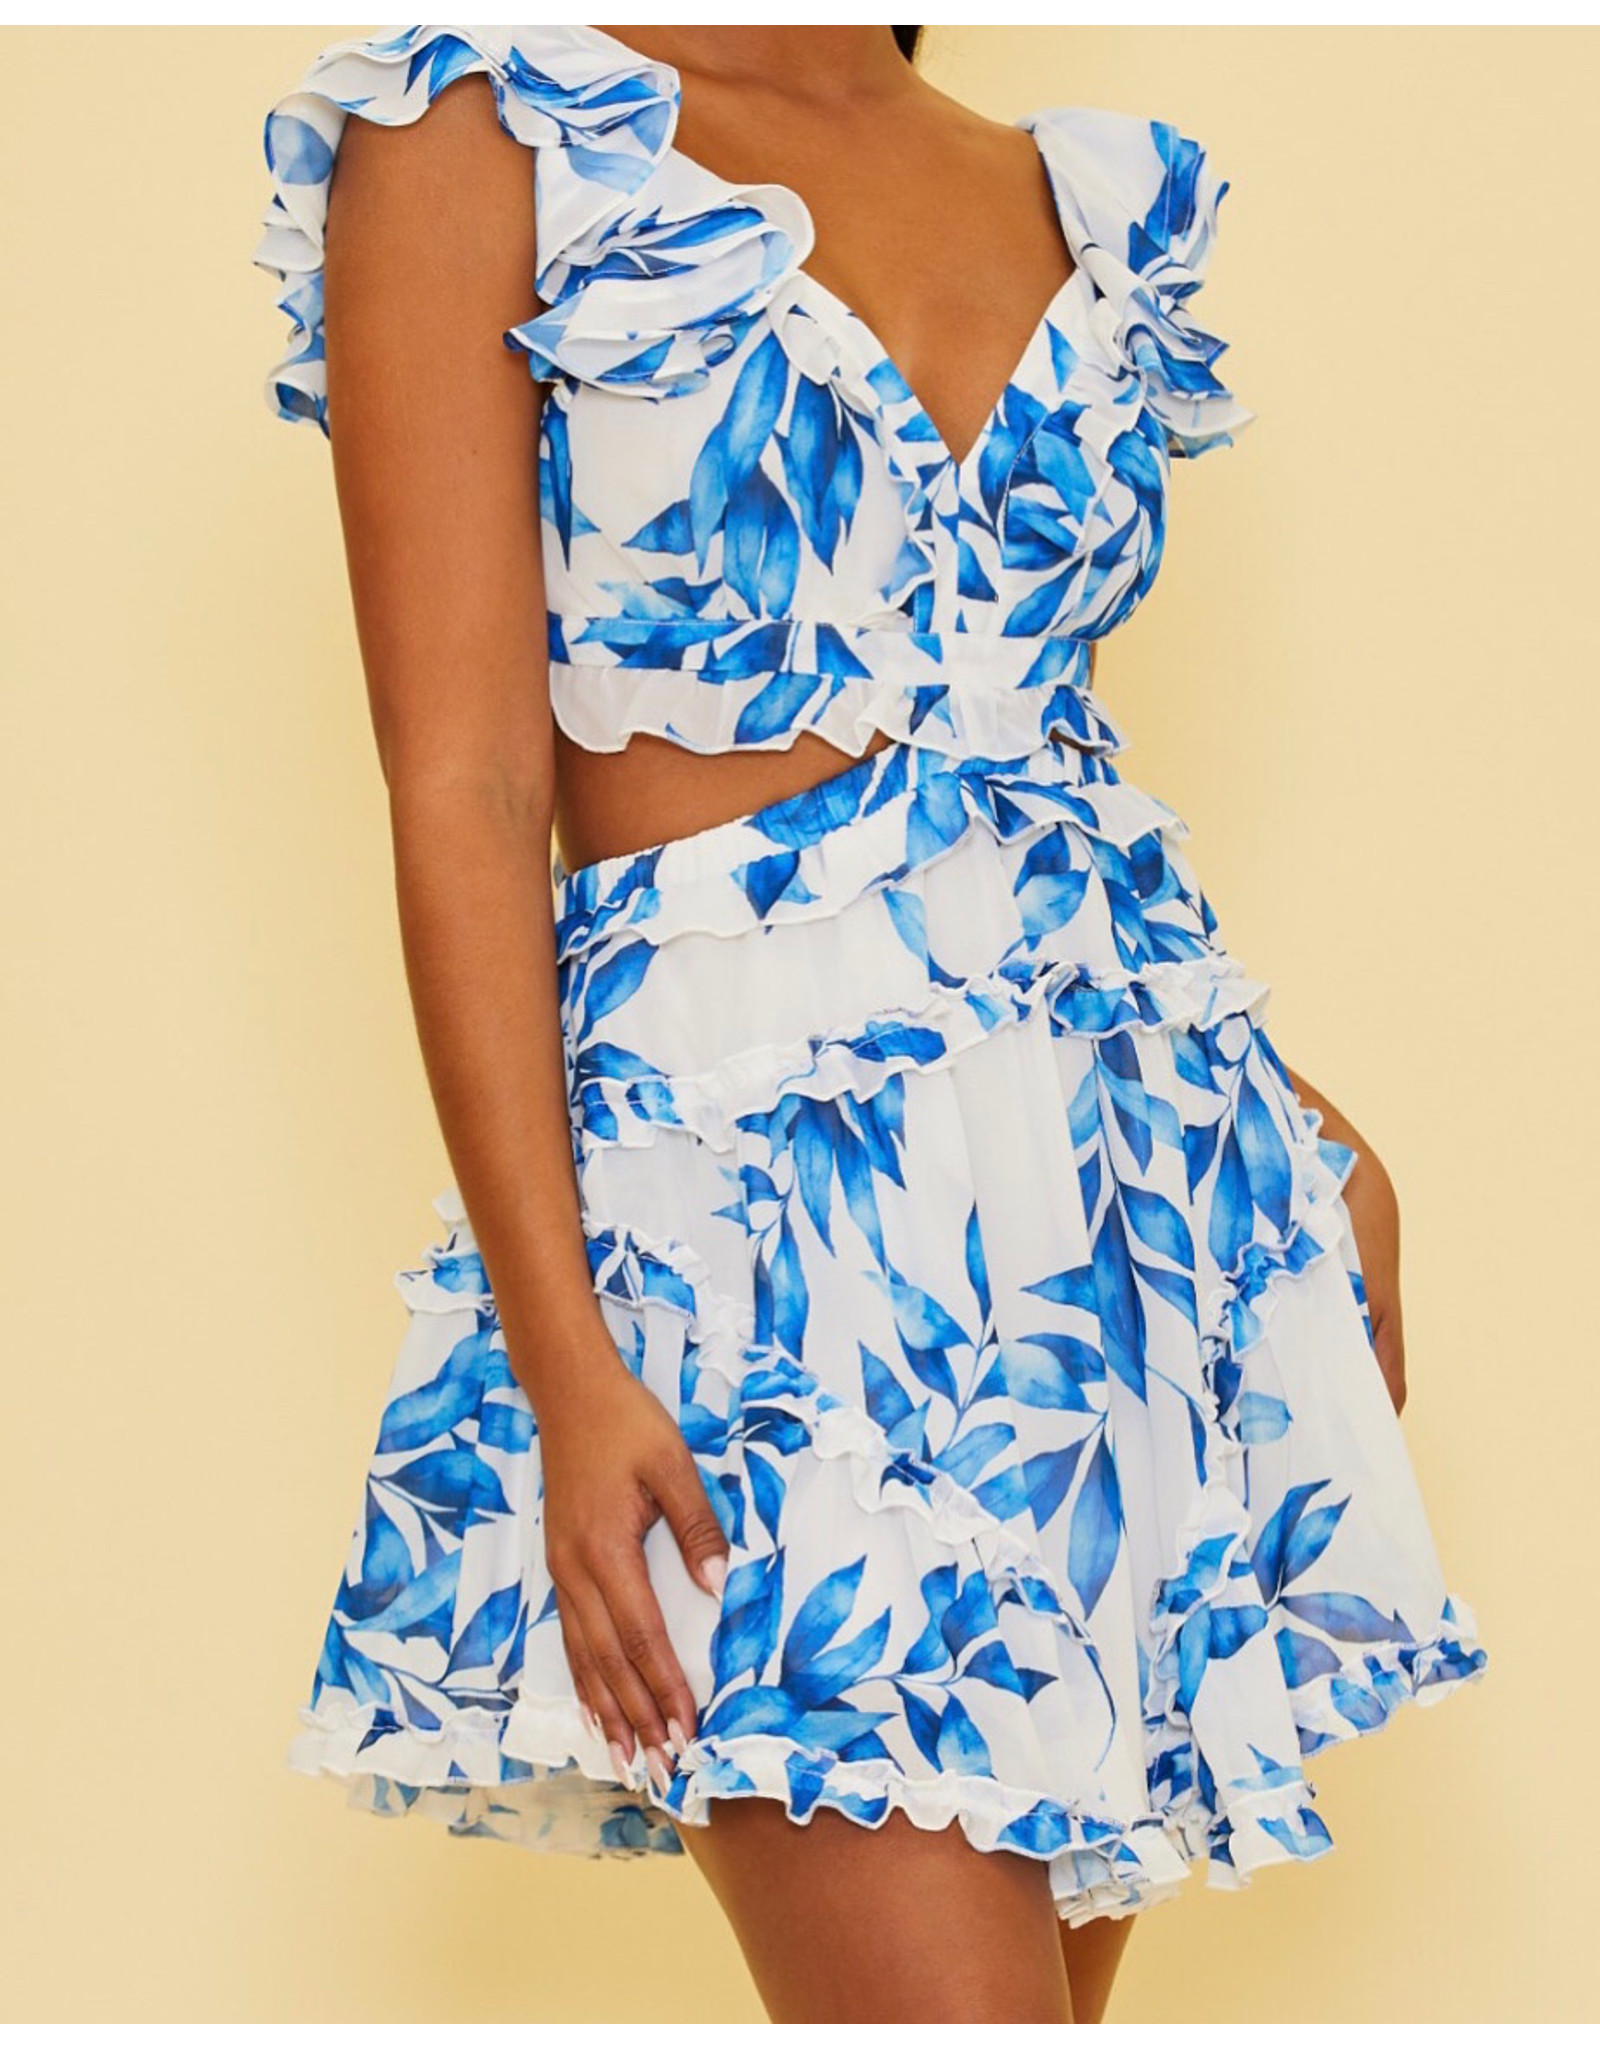 Leaves Lace Up Back Dress - Blue